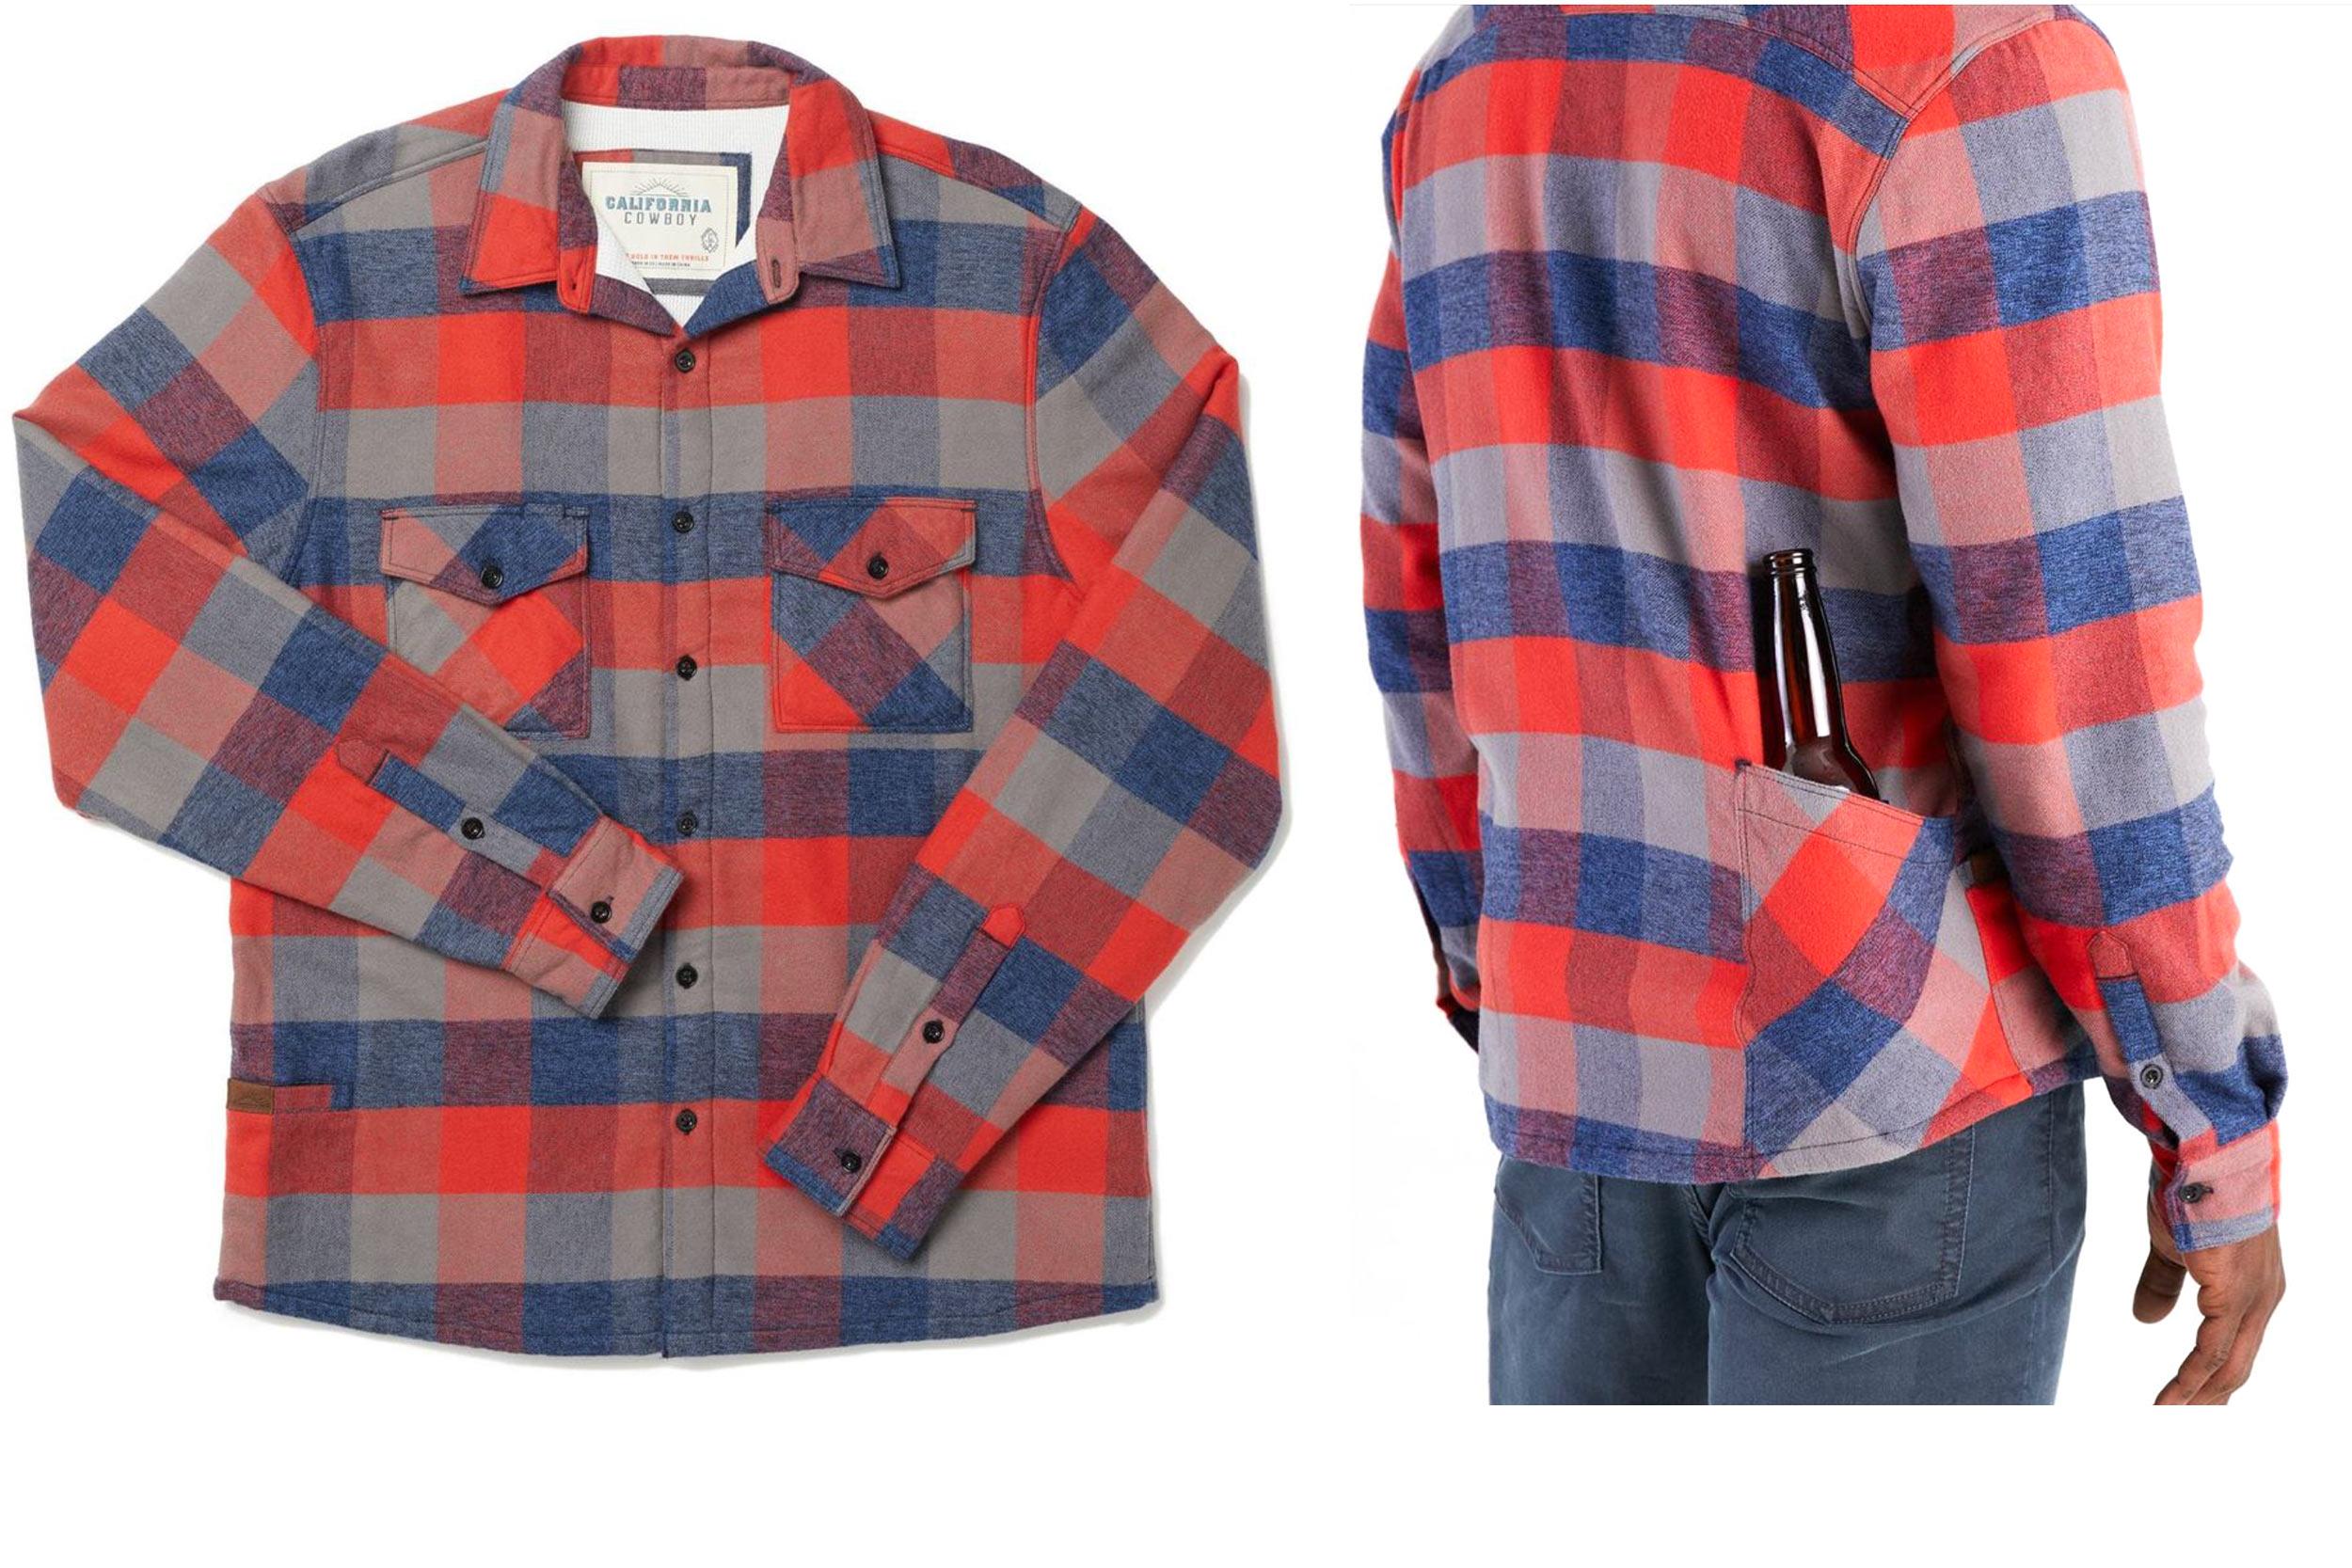 GearJunkie_Best_Flannels_2021_California_Cowboy_High_Sierra_Shirt